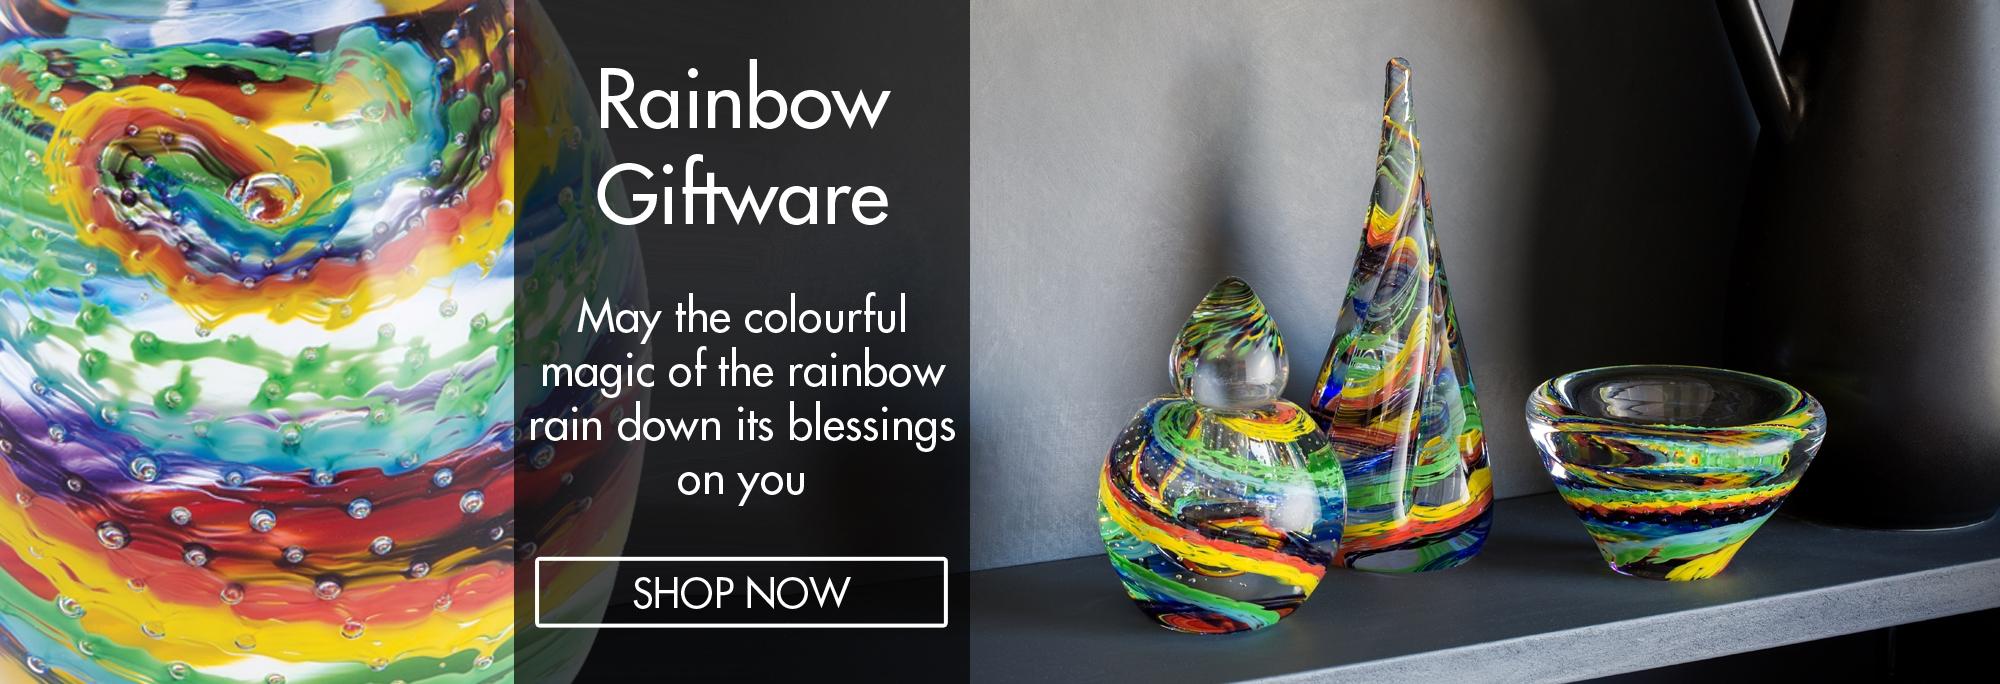 Caithness Glass - Rainbow Giftware